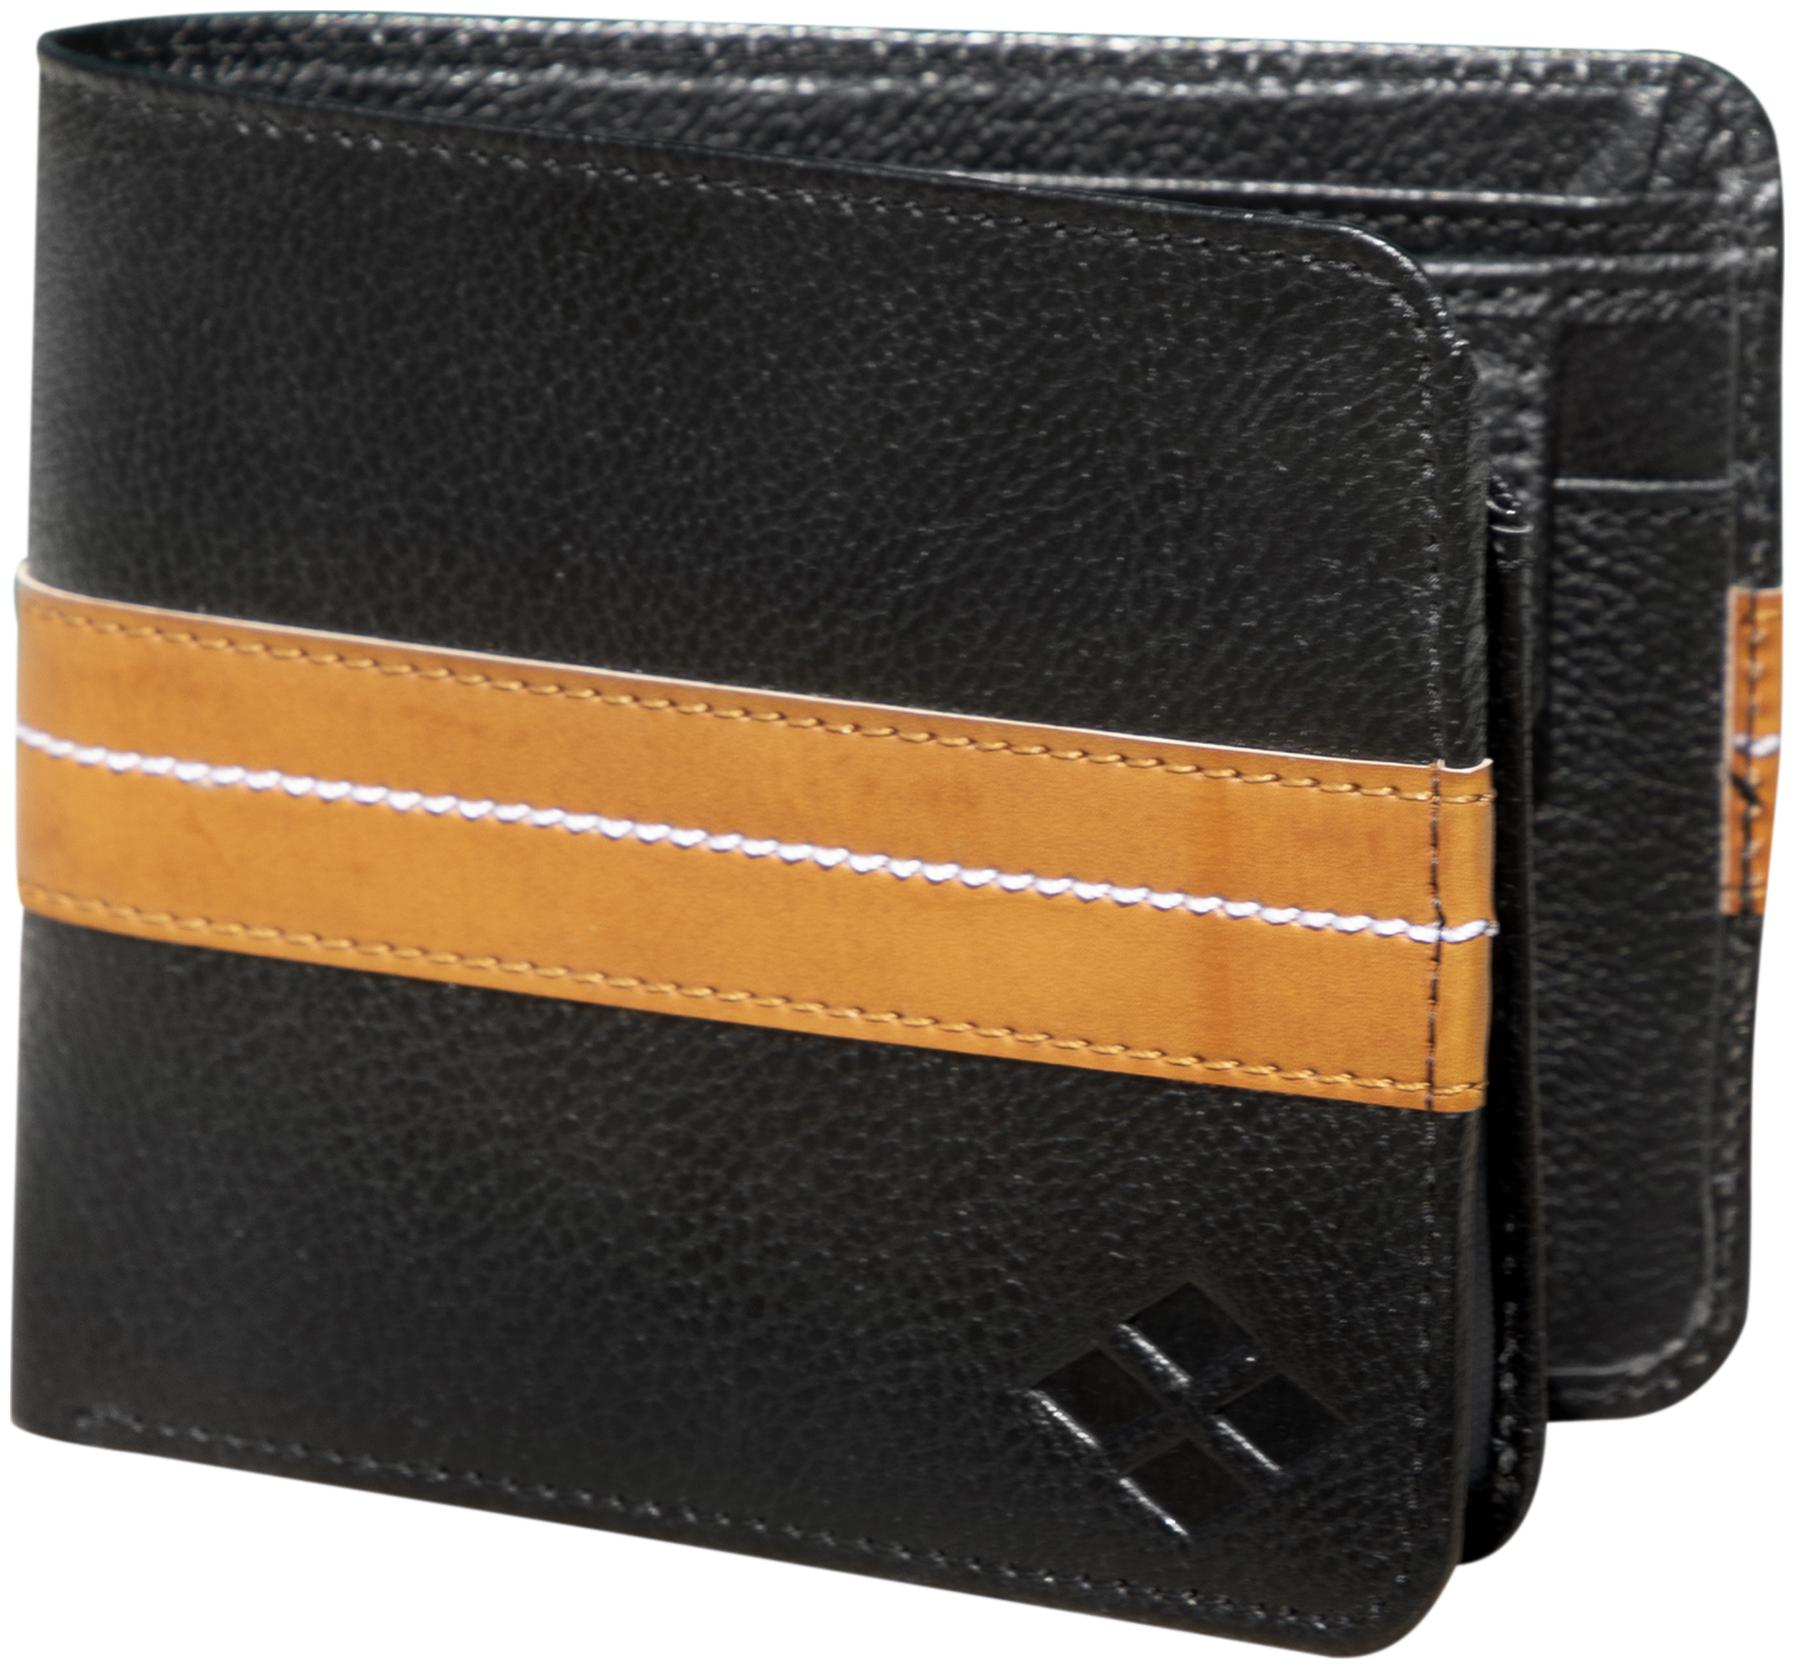 LUXIQE Men Black Artificial Leather Wallet  WL1002BK  by Health Life